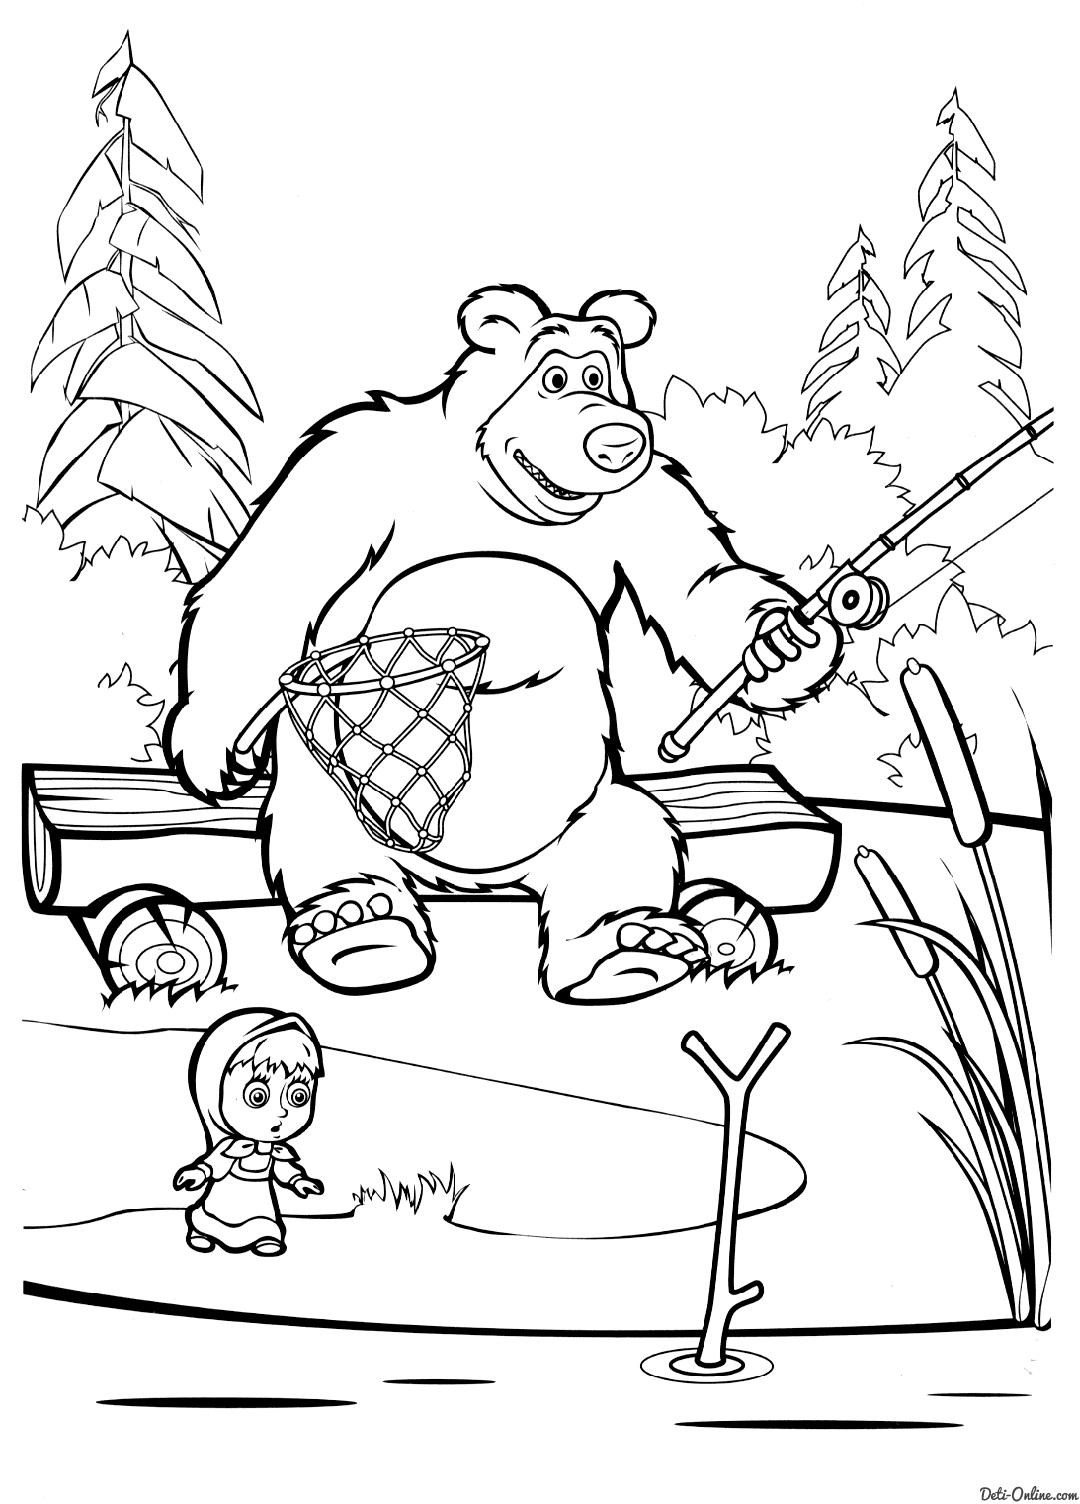 Раскраска маша и медведь на рыбалке